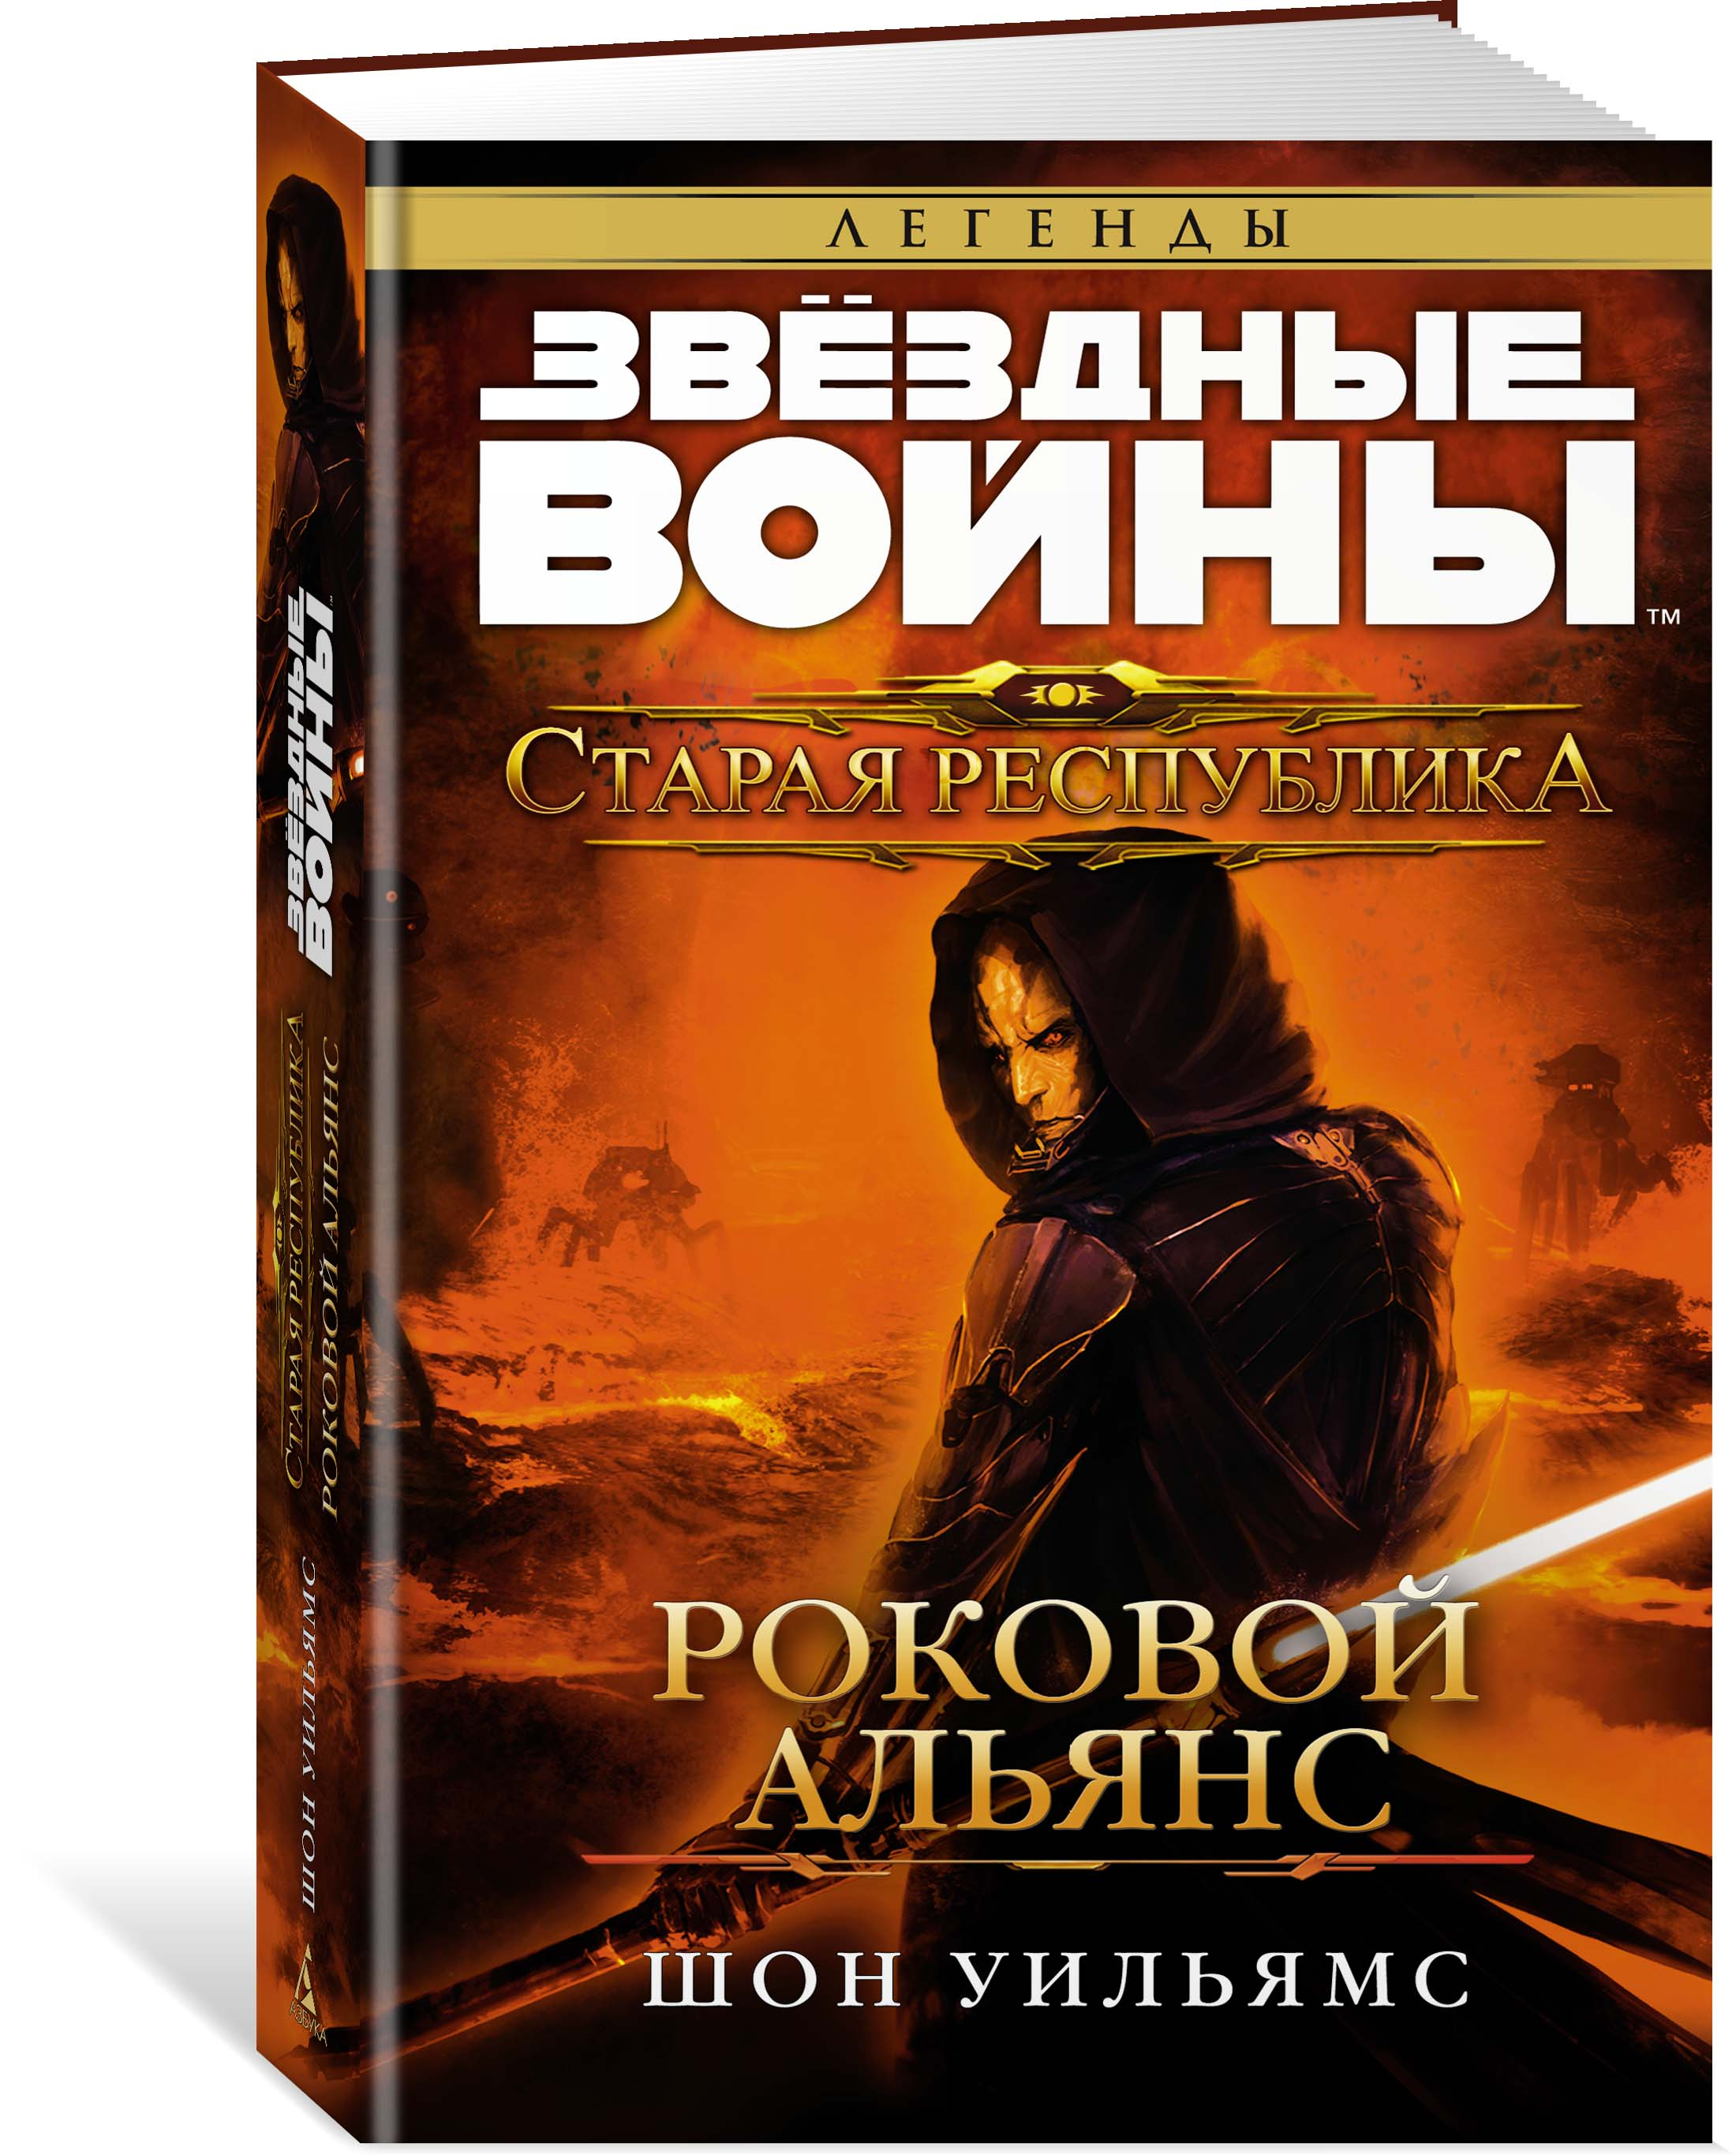 Zakazat.ru: Старая Республика. Роковой альянс. Шон Уильямс